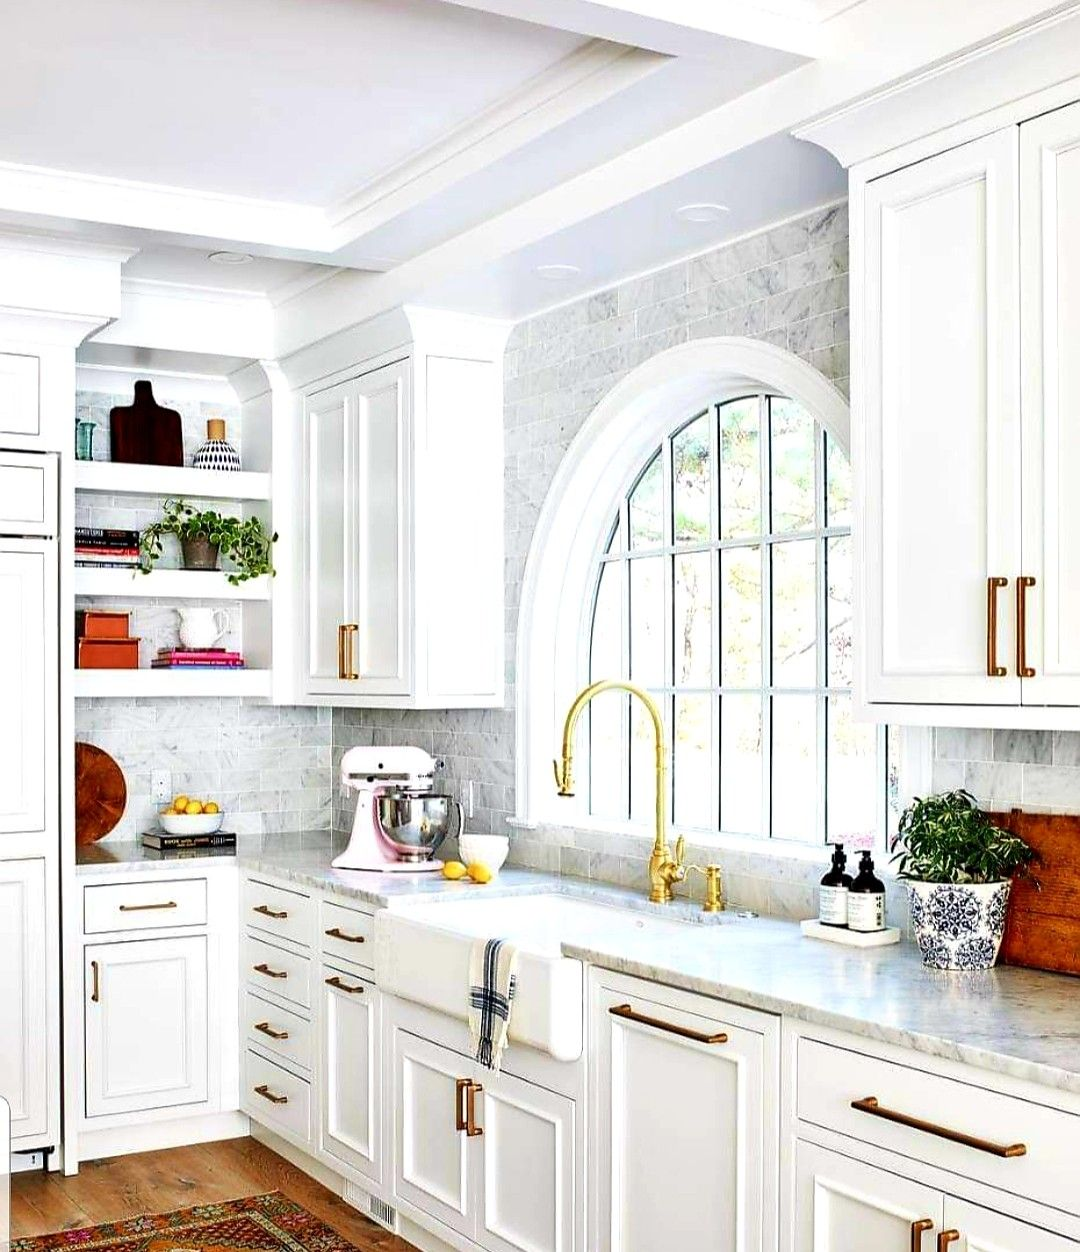 elegant kitchens image by sherry allnutt on kitchen ideas kitchen decor classic white kitchen on kitchen ideas elegant id=39180